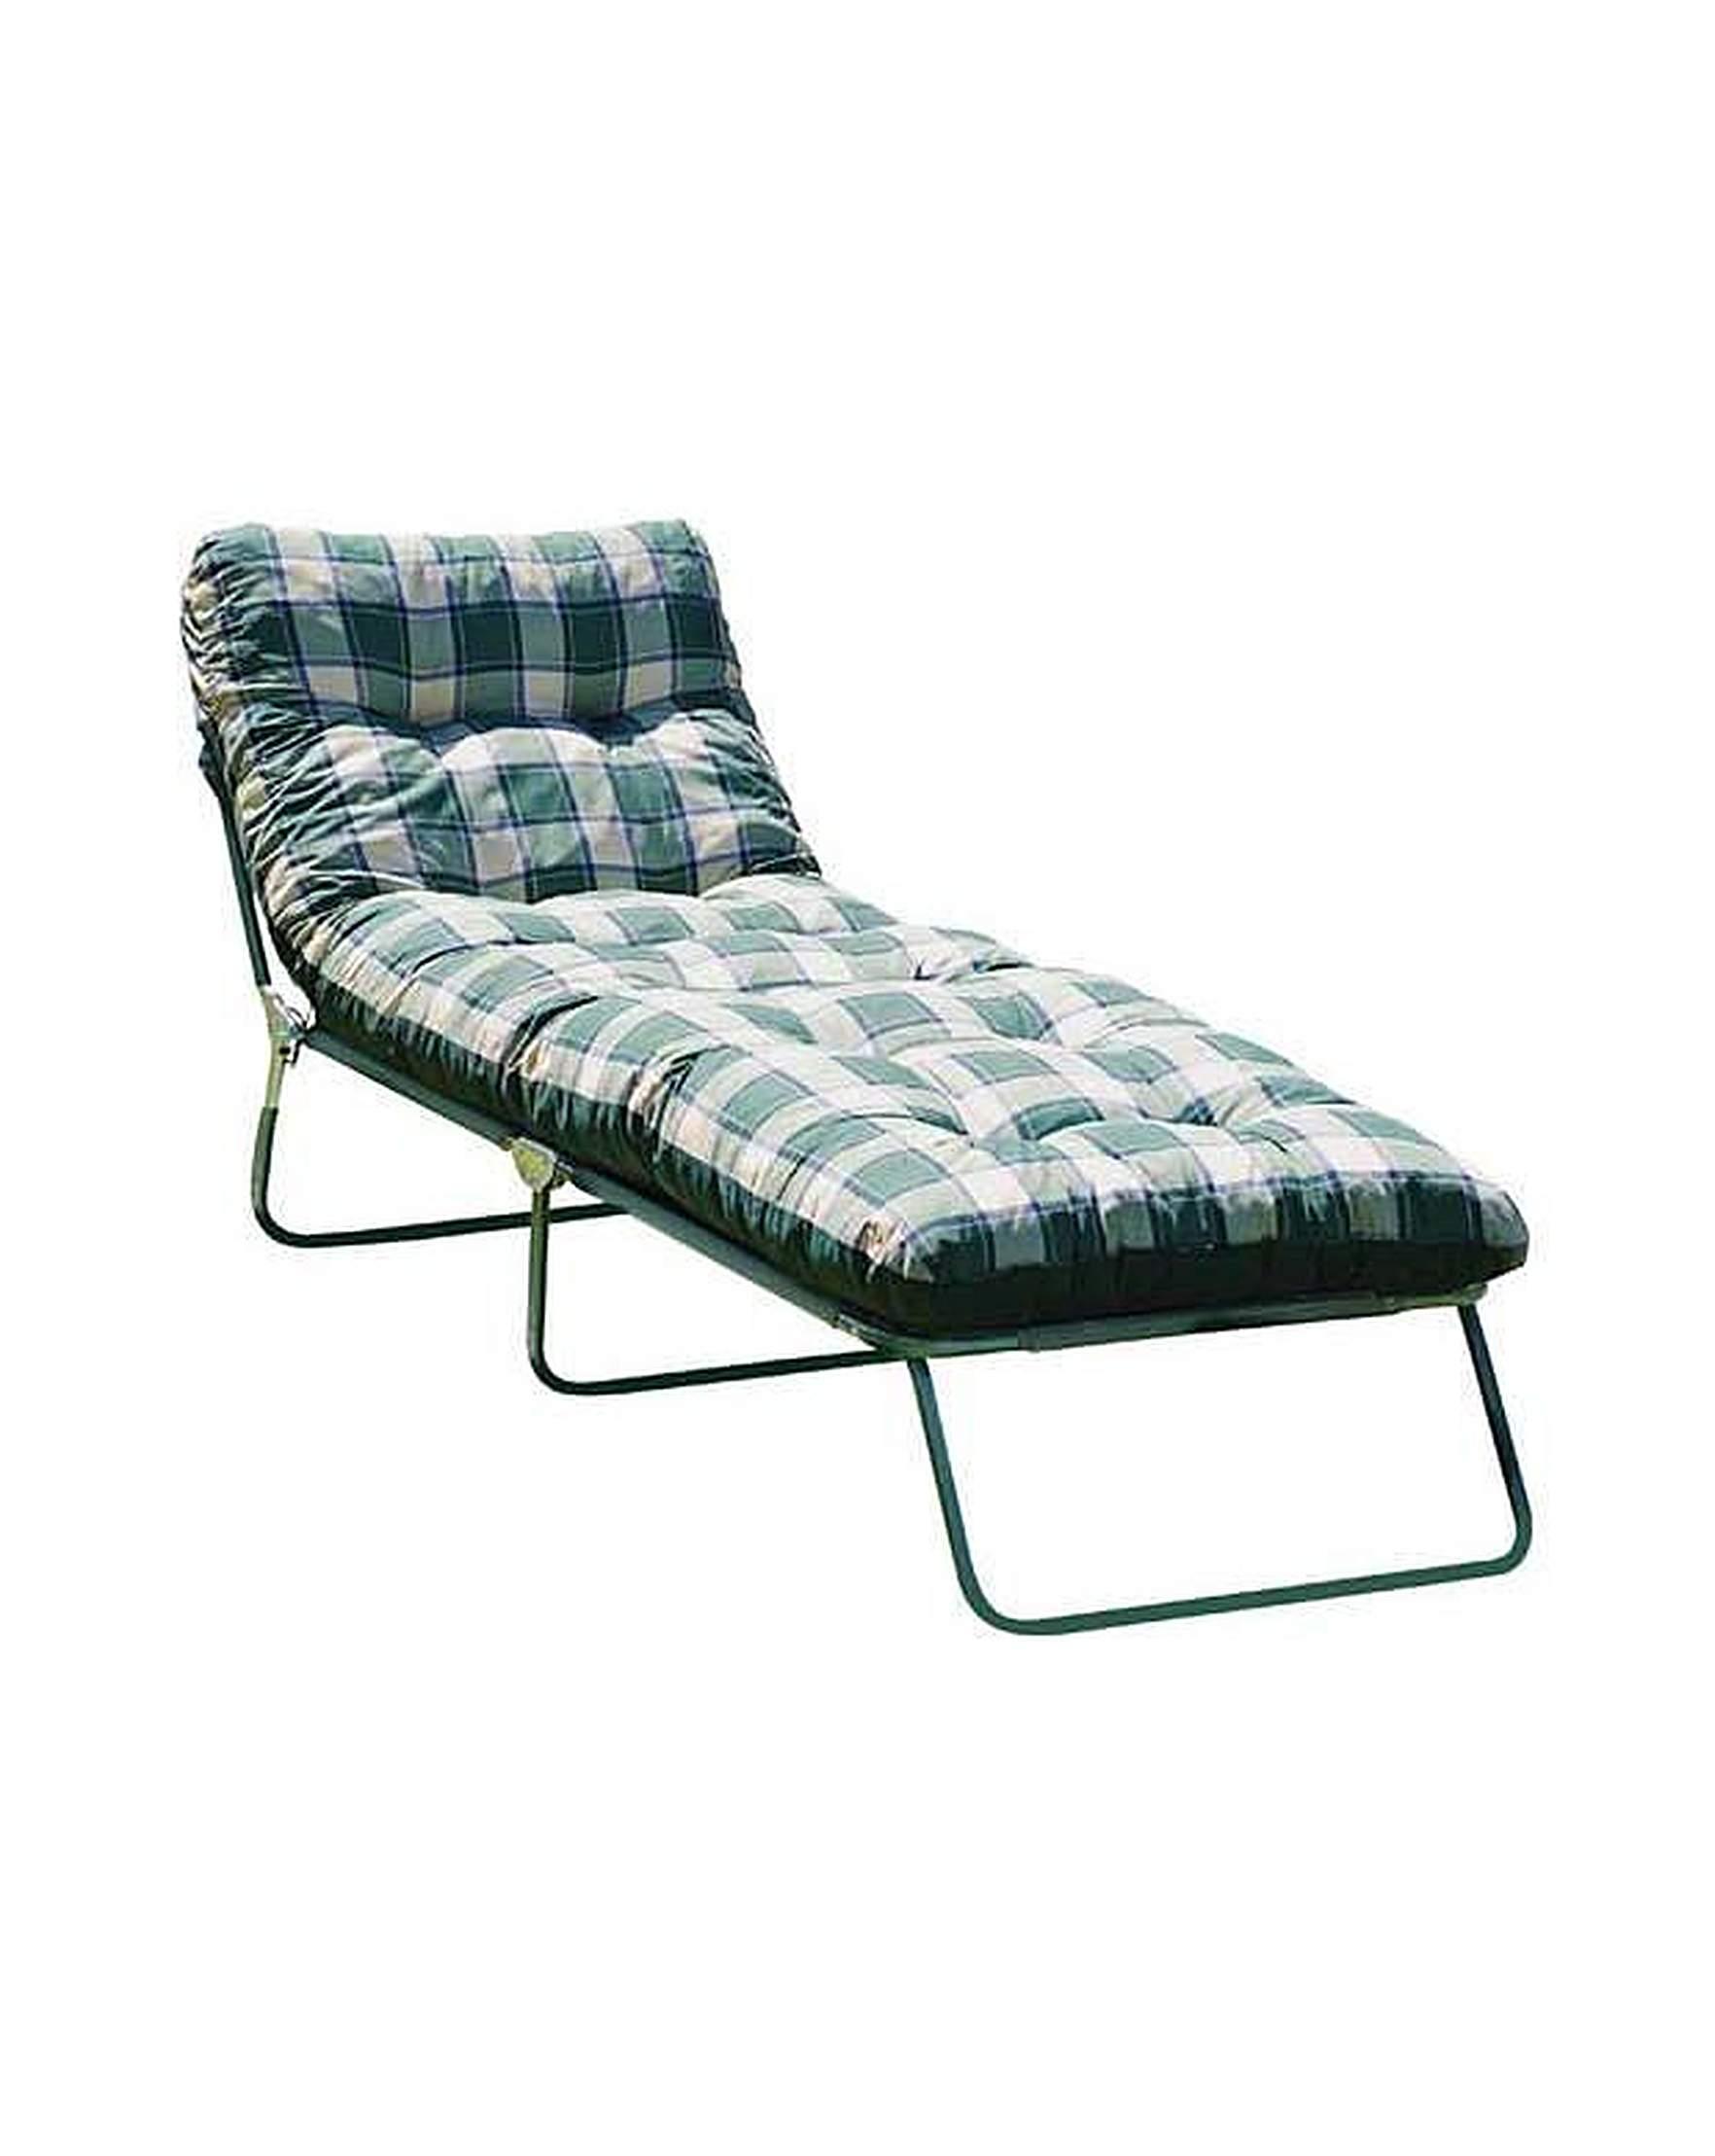 multi position sun lounger with cushion j d williams